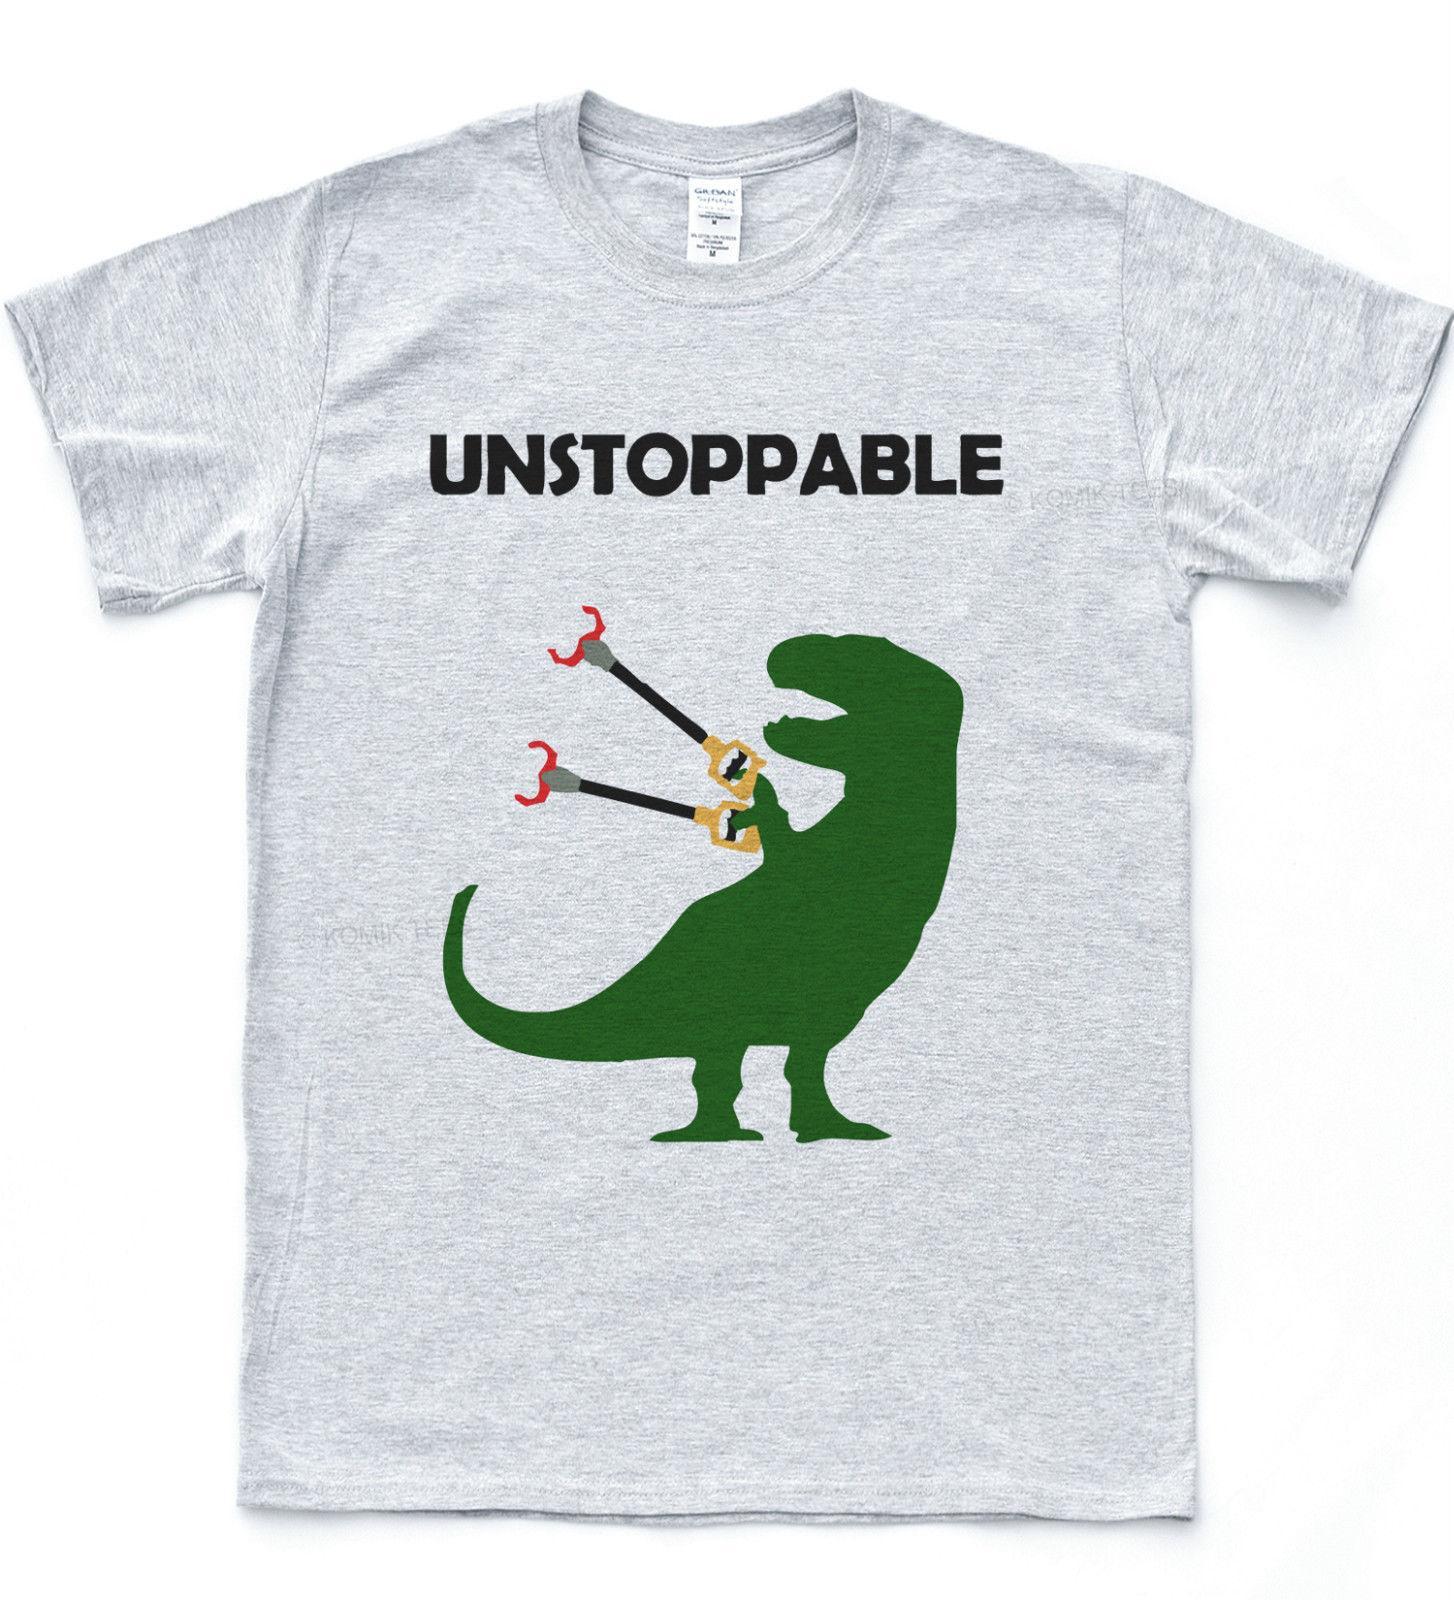 1e9610e0 Unstoppable T Rex T Shirt Funny Drawing Dinosaur Tee Dino Nature Animal  TopClassic Quality High T Shirt T Shirt Making T Shirts For Sale From  Qz2271839488, ...